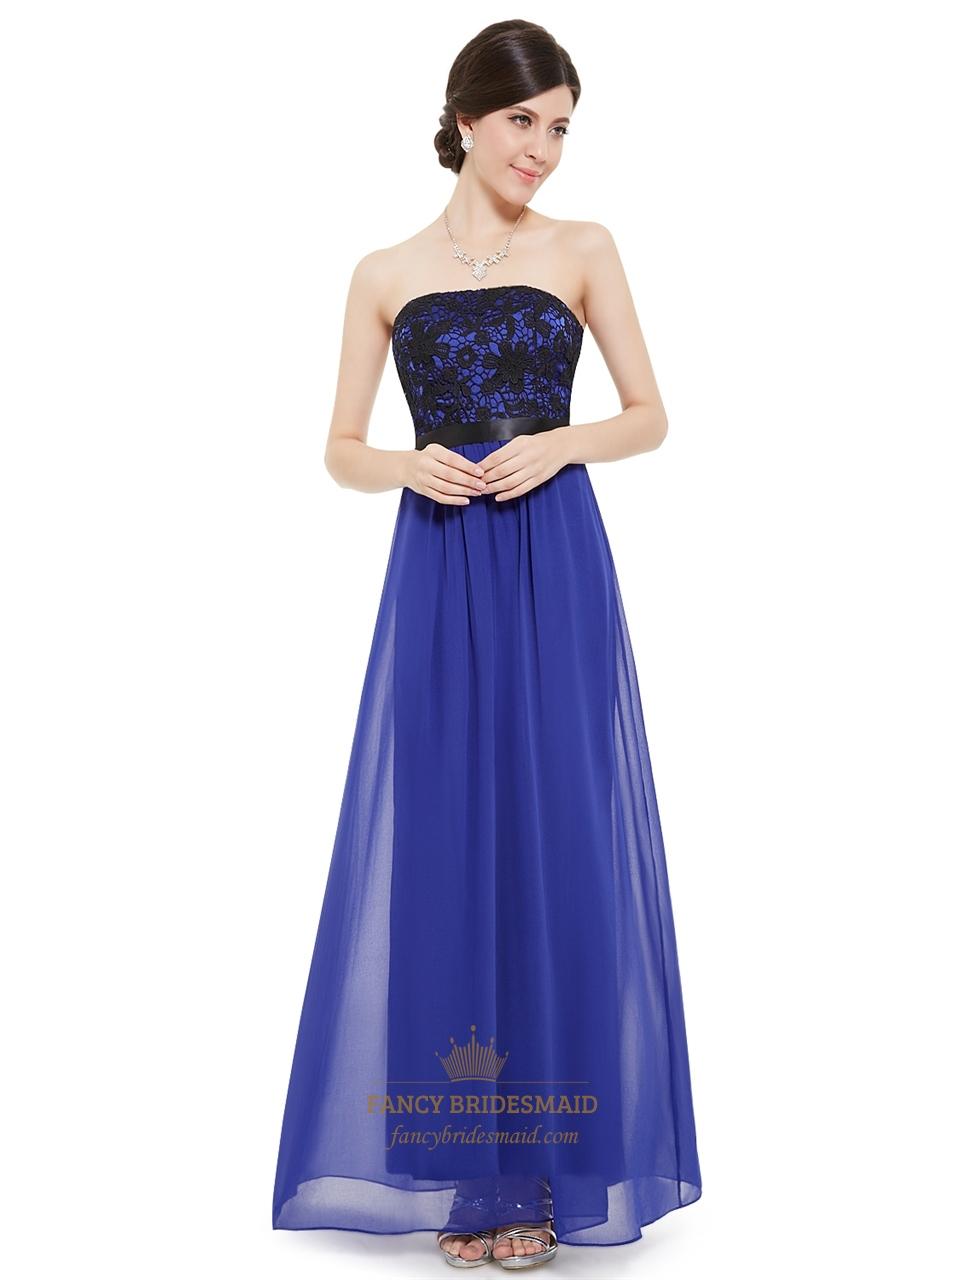 Royal Blue Strapless Chiffon Long Bridesmaid Dress With Lace Bodice ...